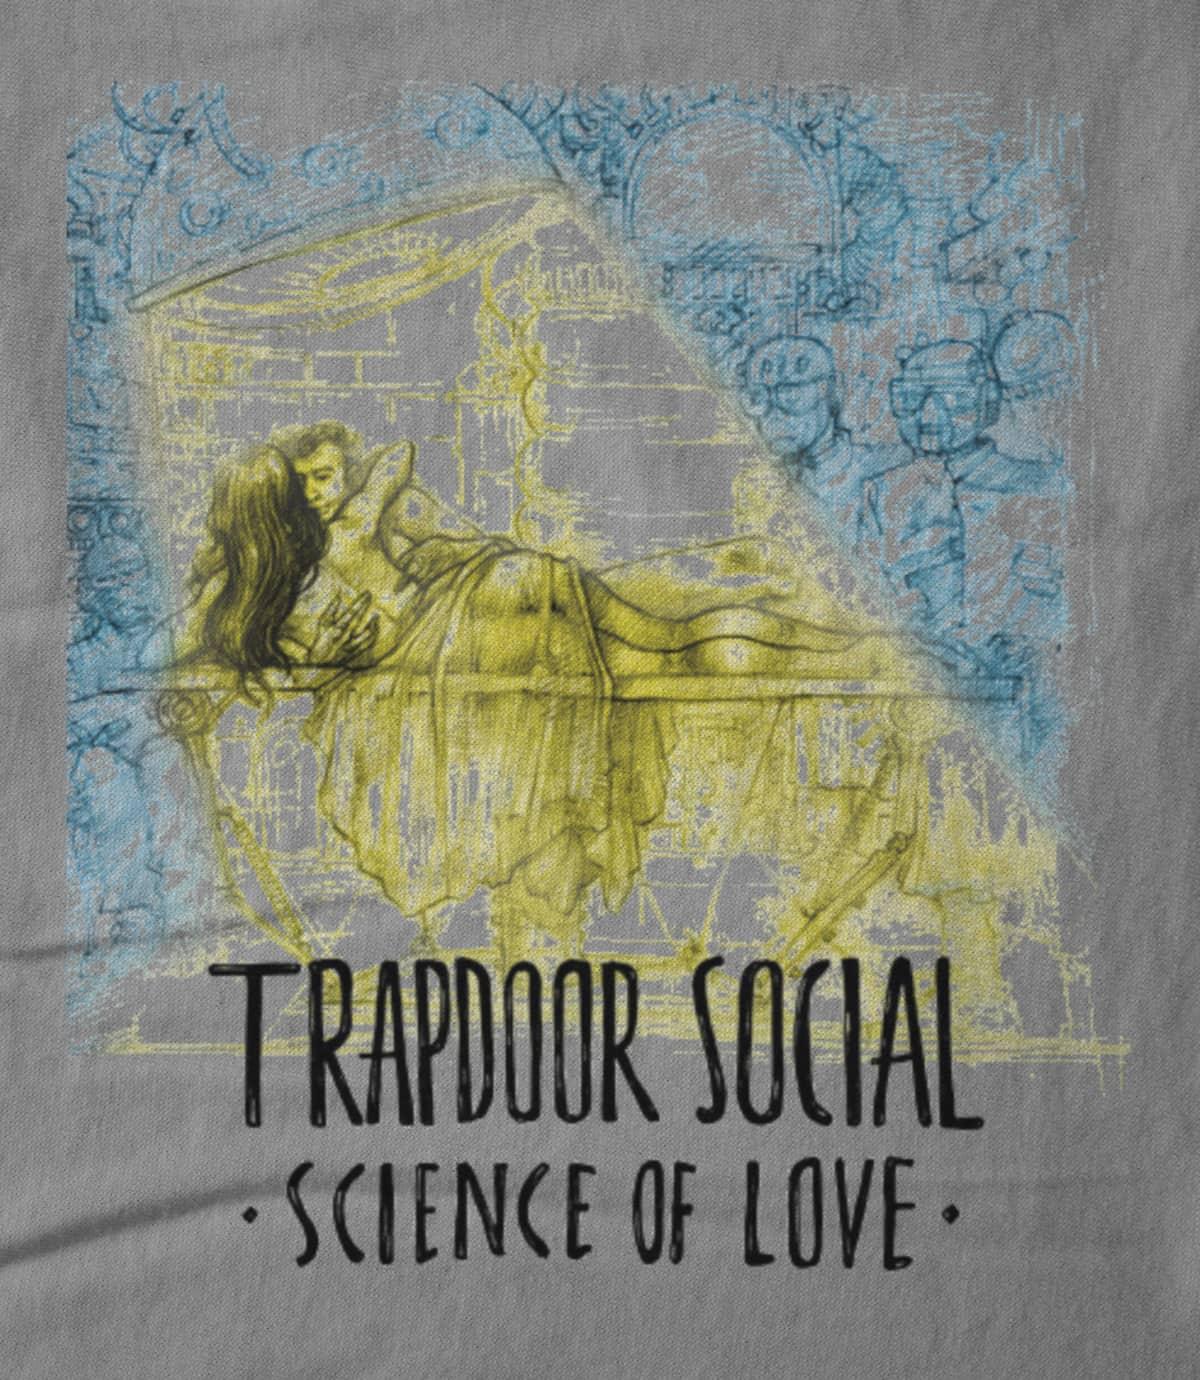 Trapdoor social science of love artwork 1481009854